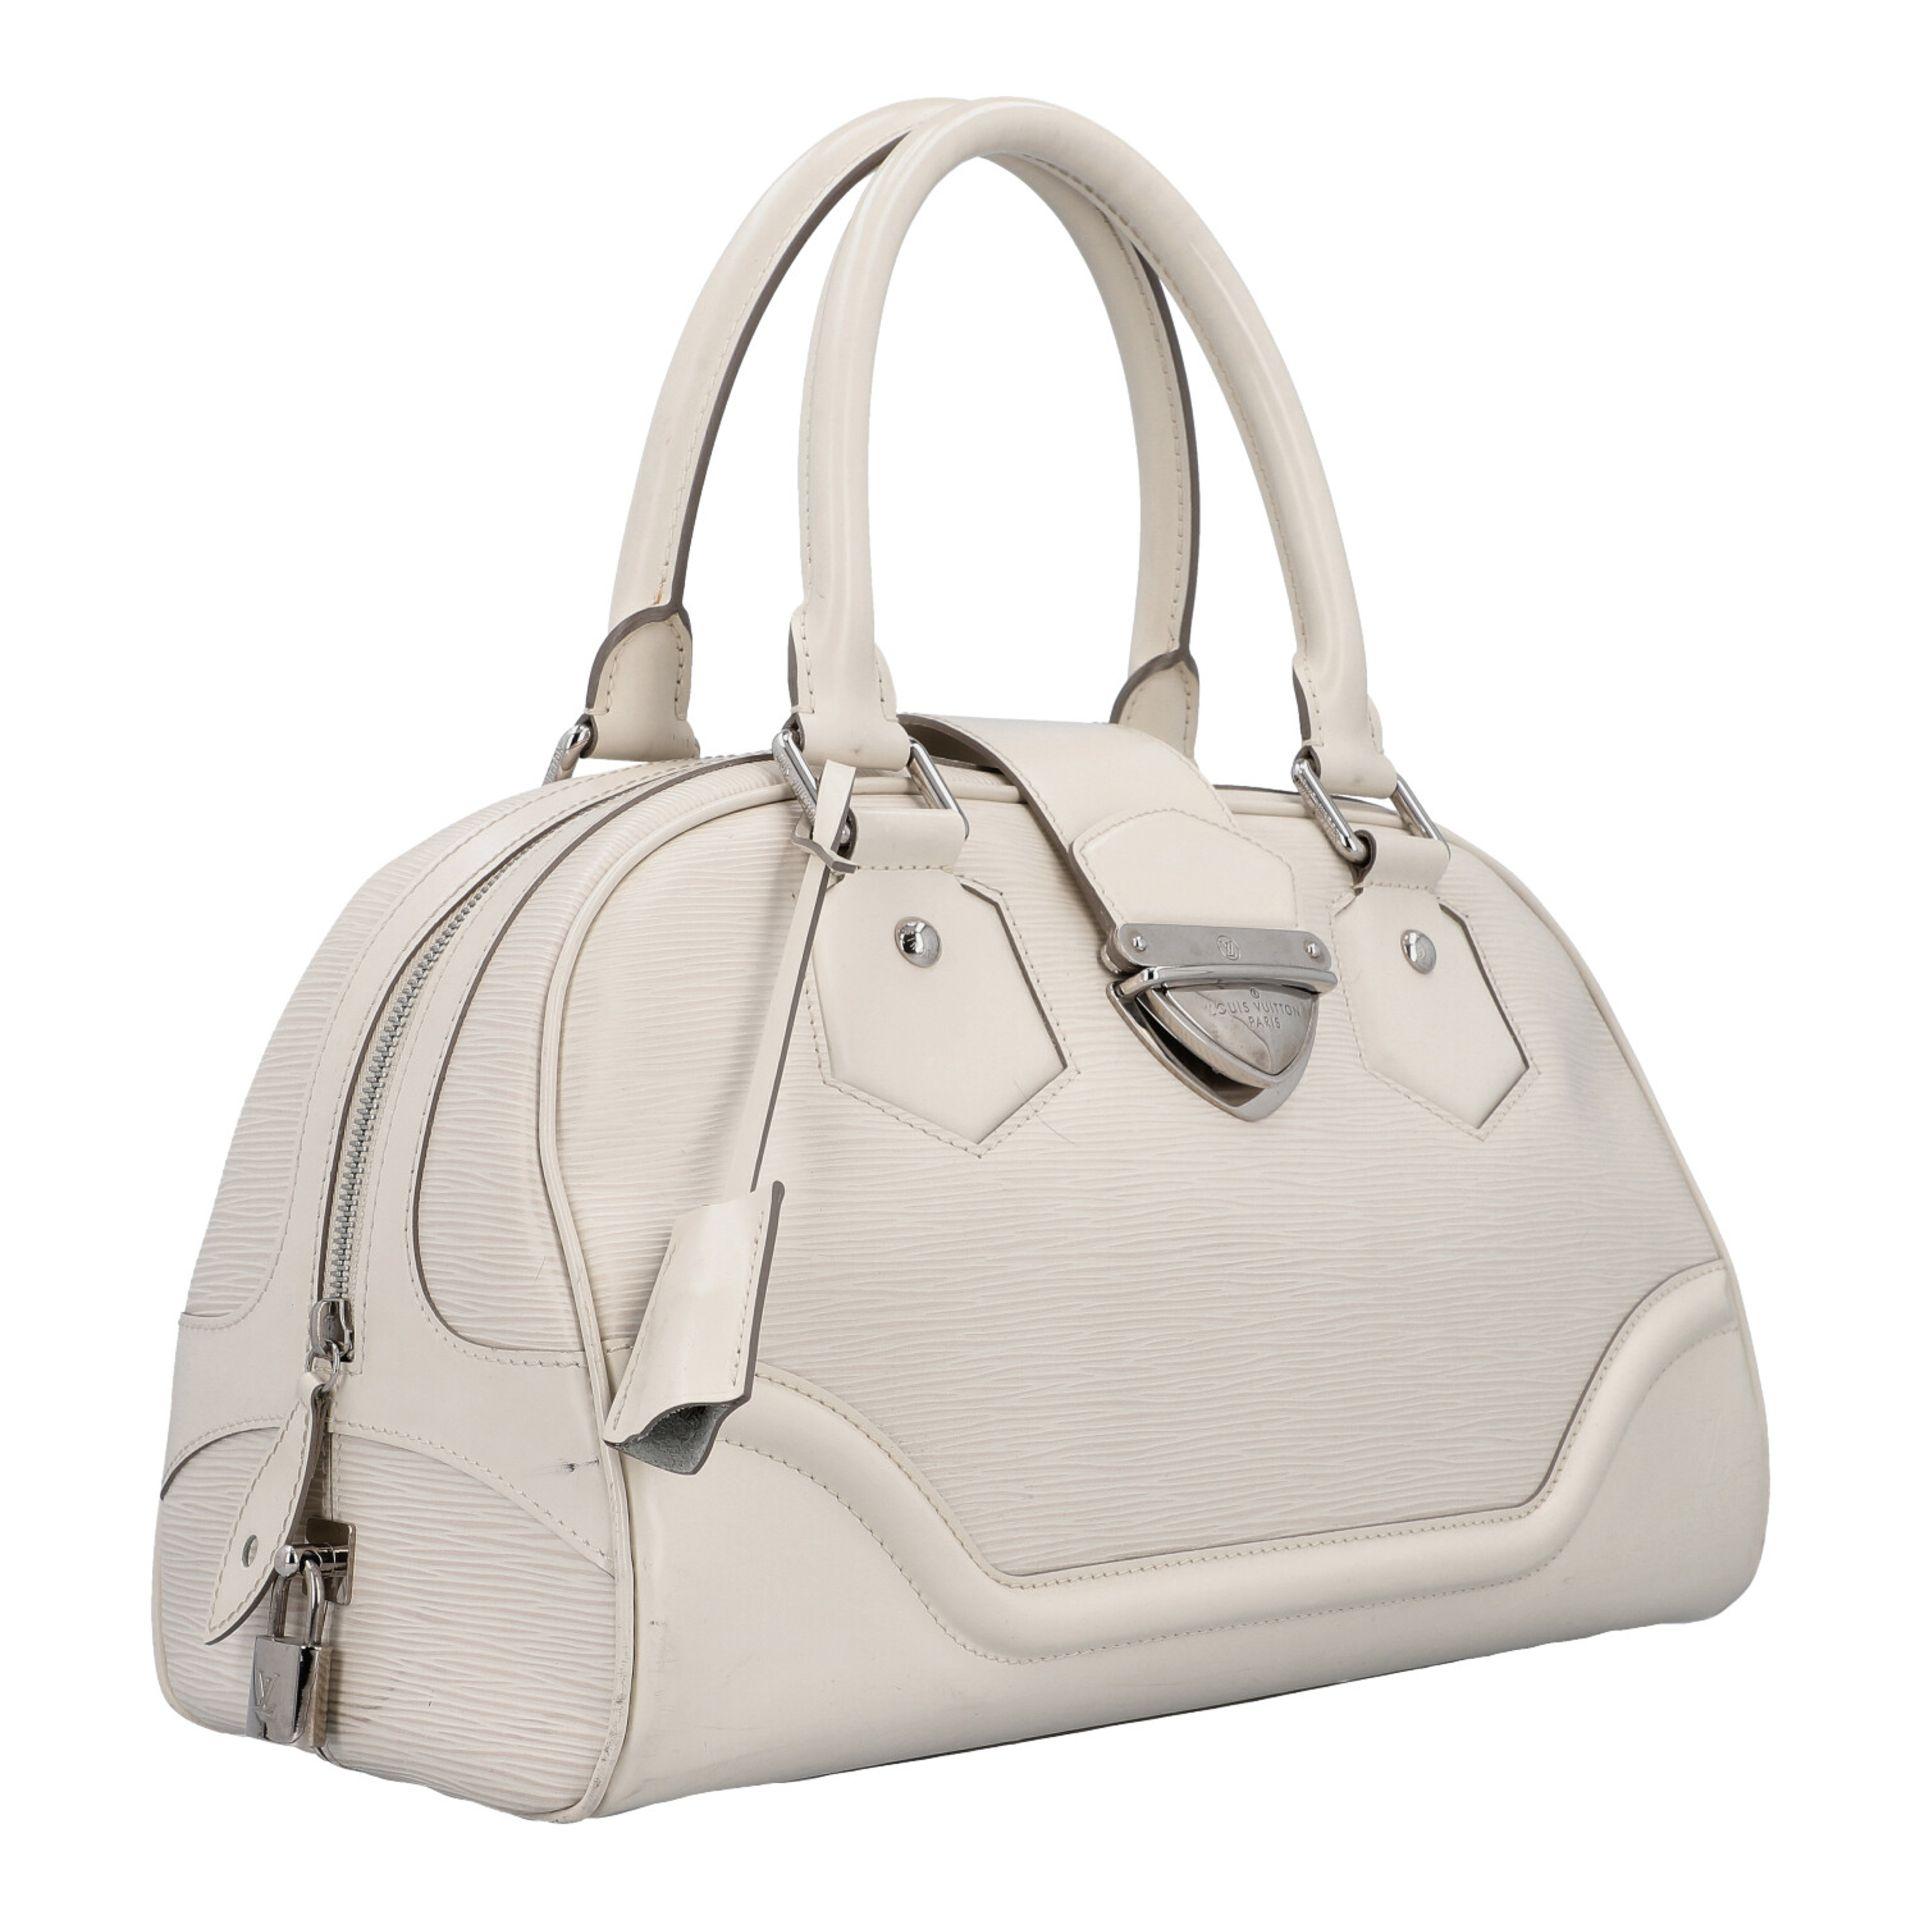 "LOUIS VUITTON Handtasche ""MONTAIGNE"", Koll. 2007. - Image 2 of 8"